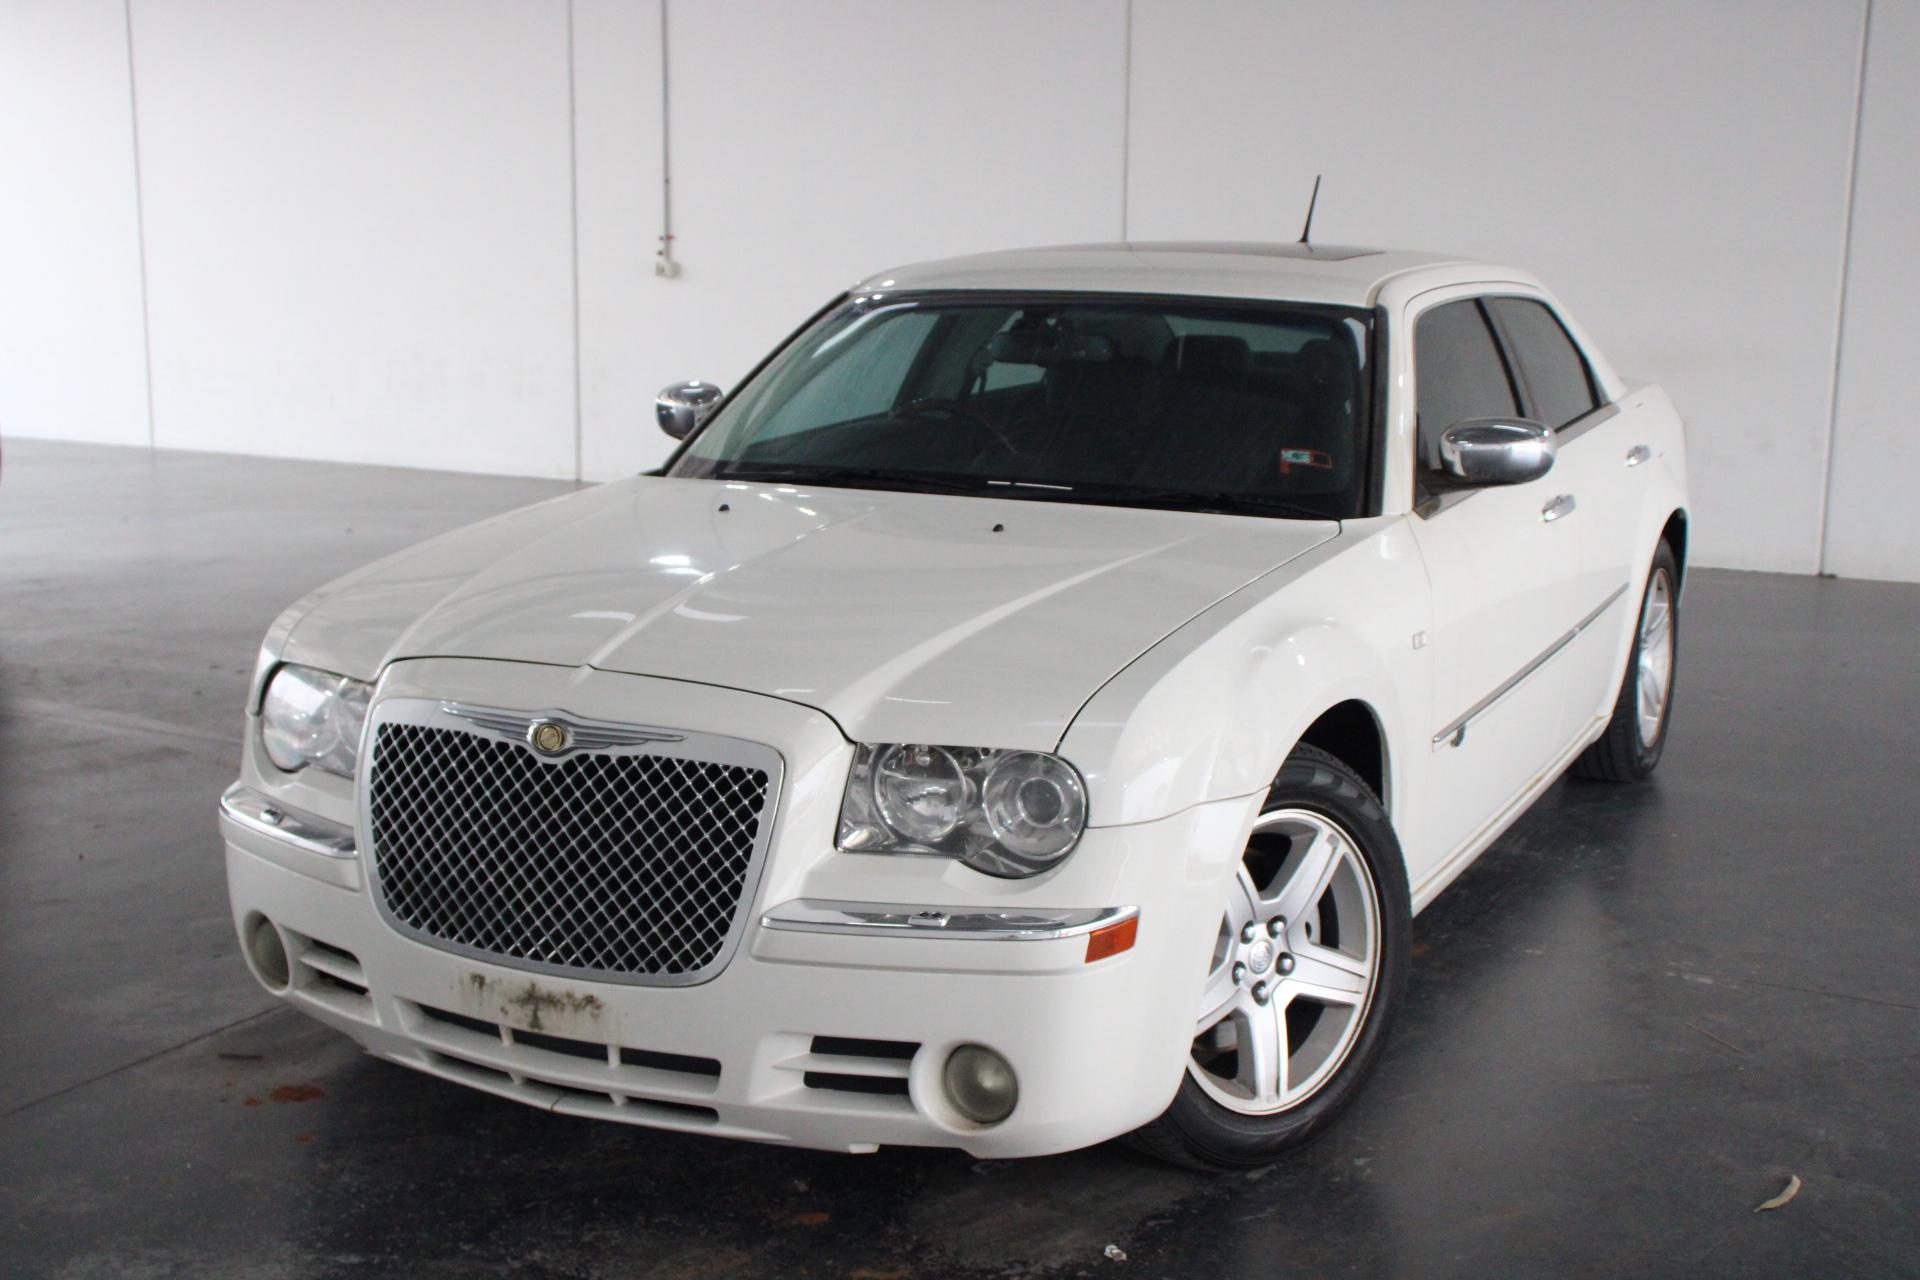 2008 Chrysler 300C 5.7 Hemi V8 LE Automatic Sedan